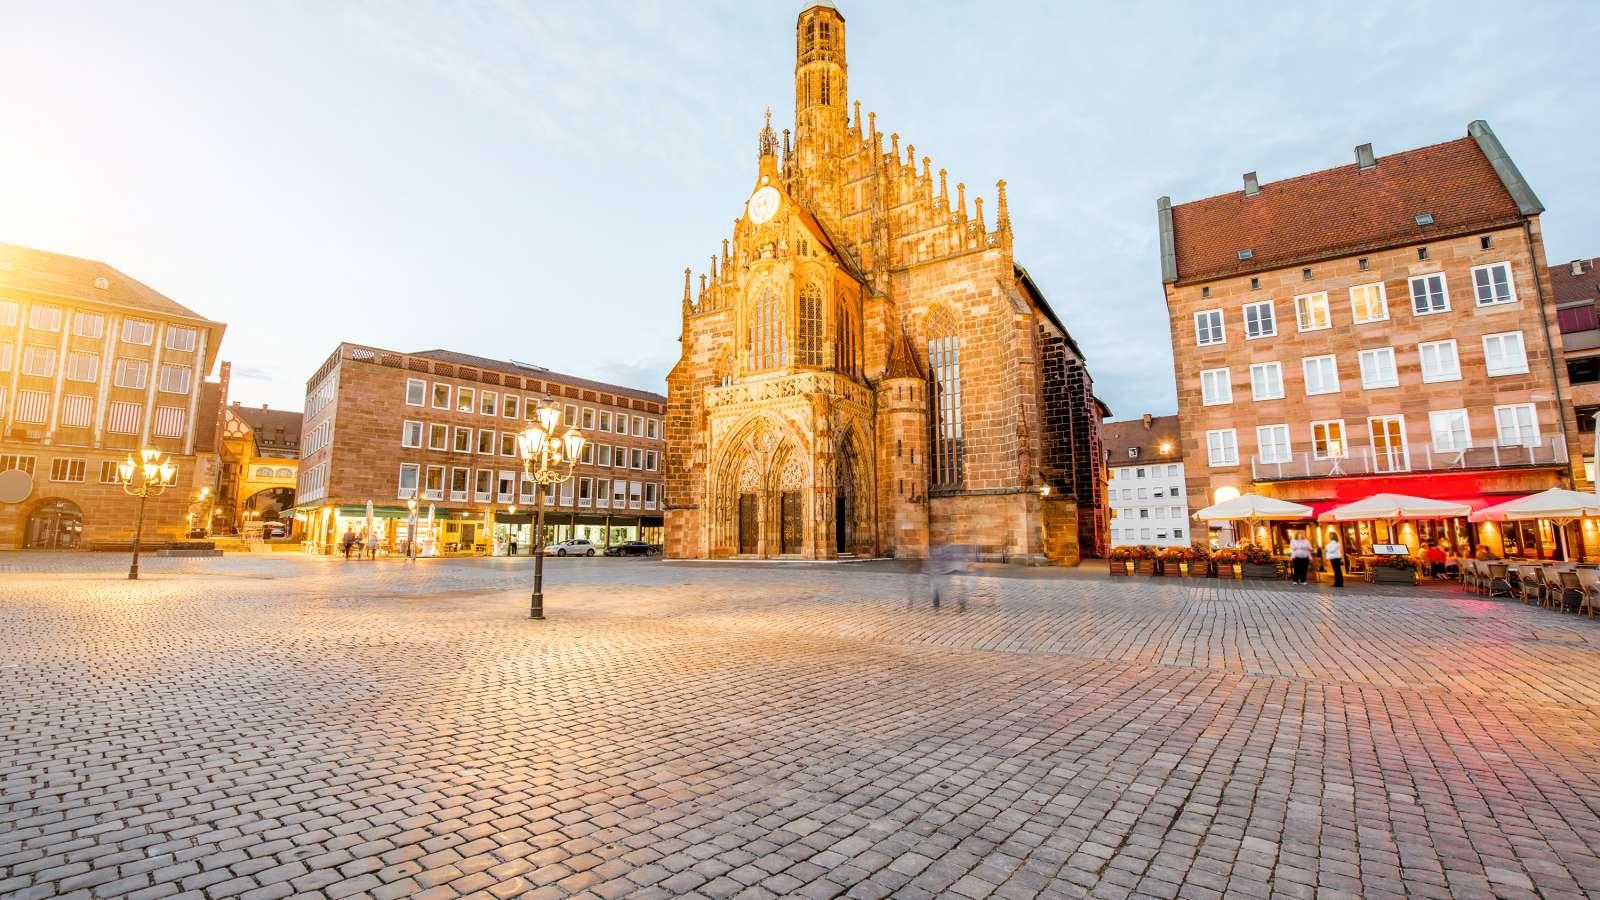 Nuremberg main market square